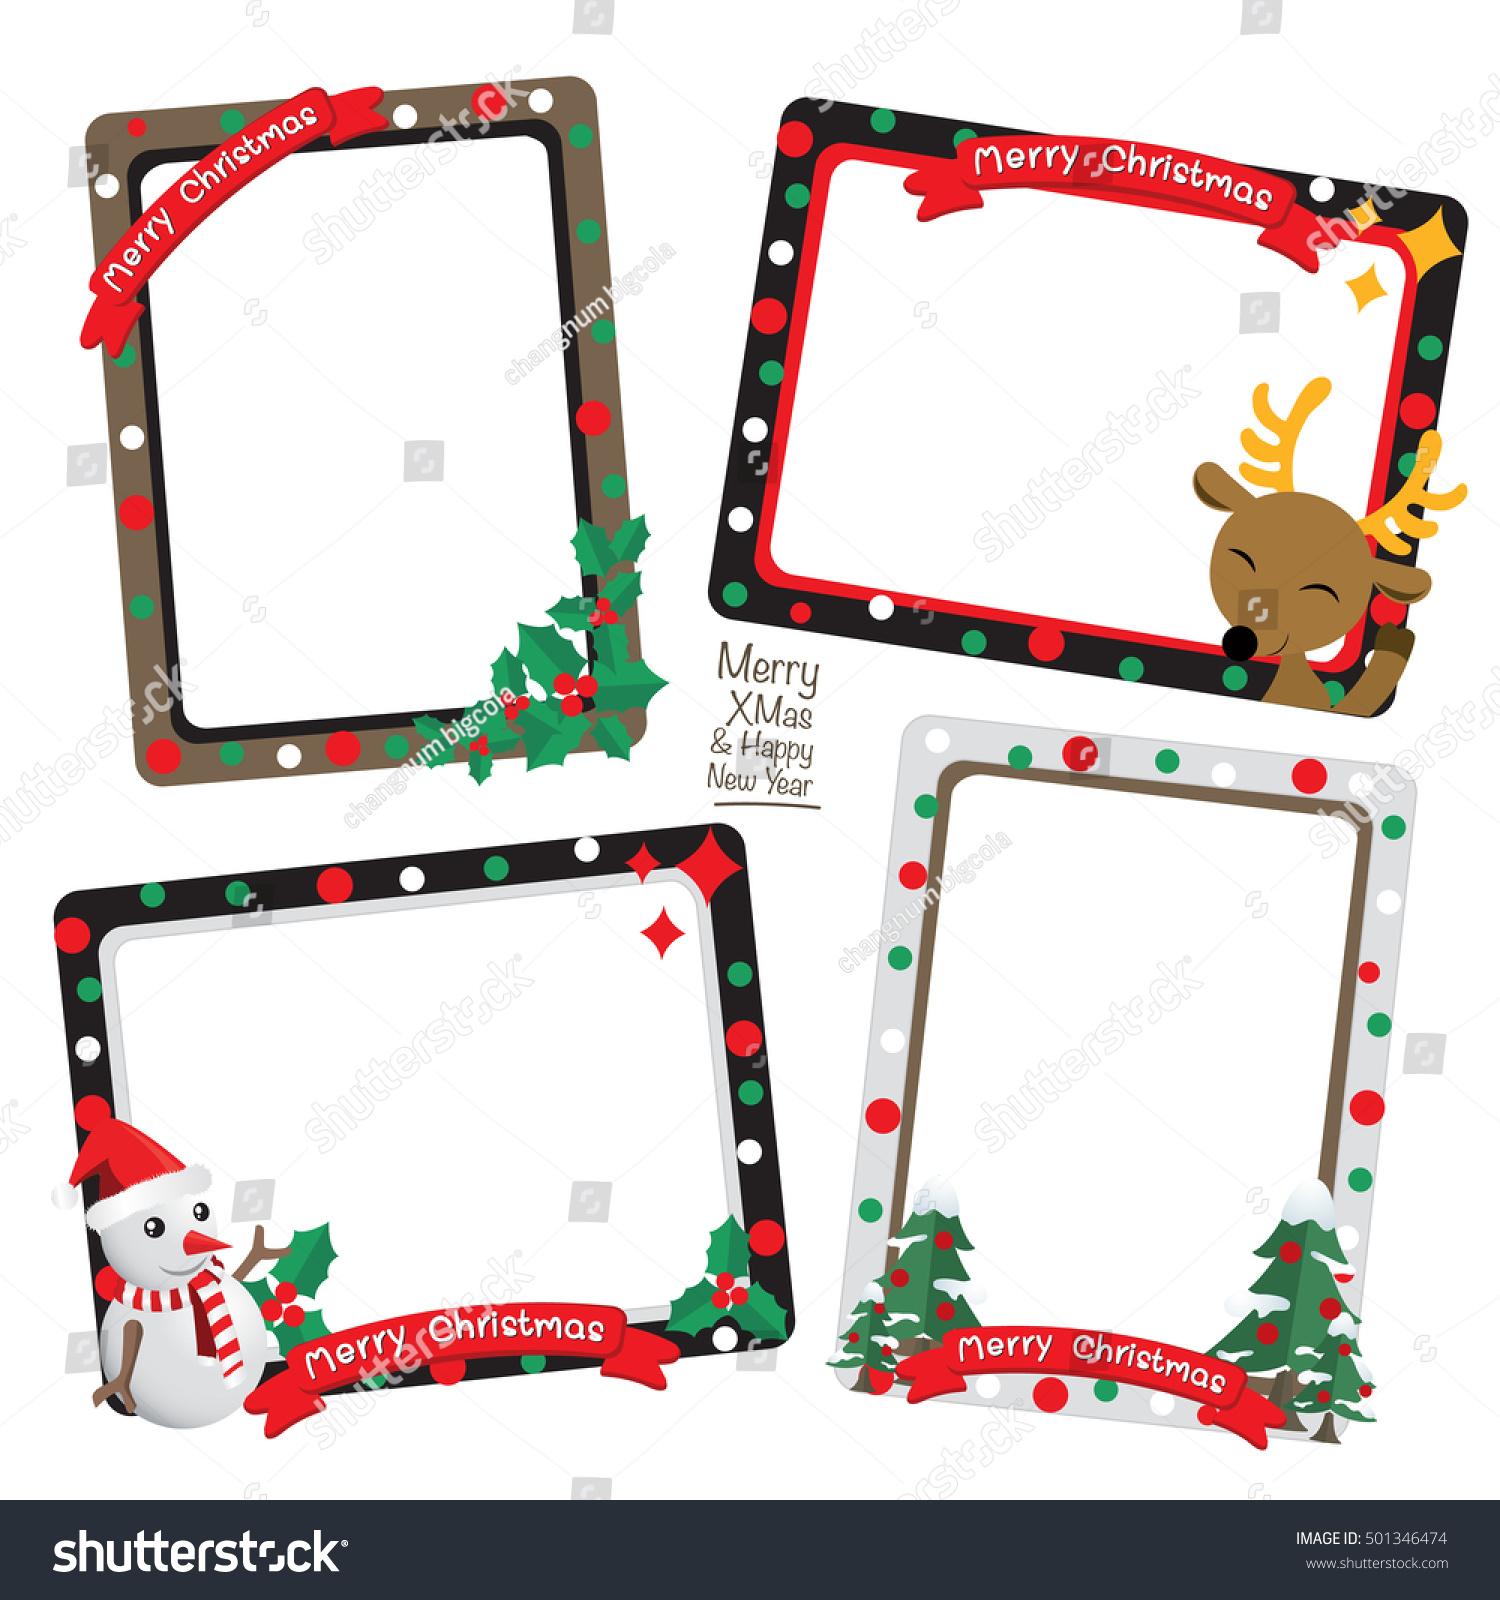 christmas greetings frames